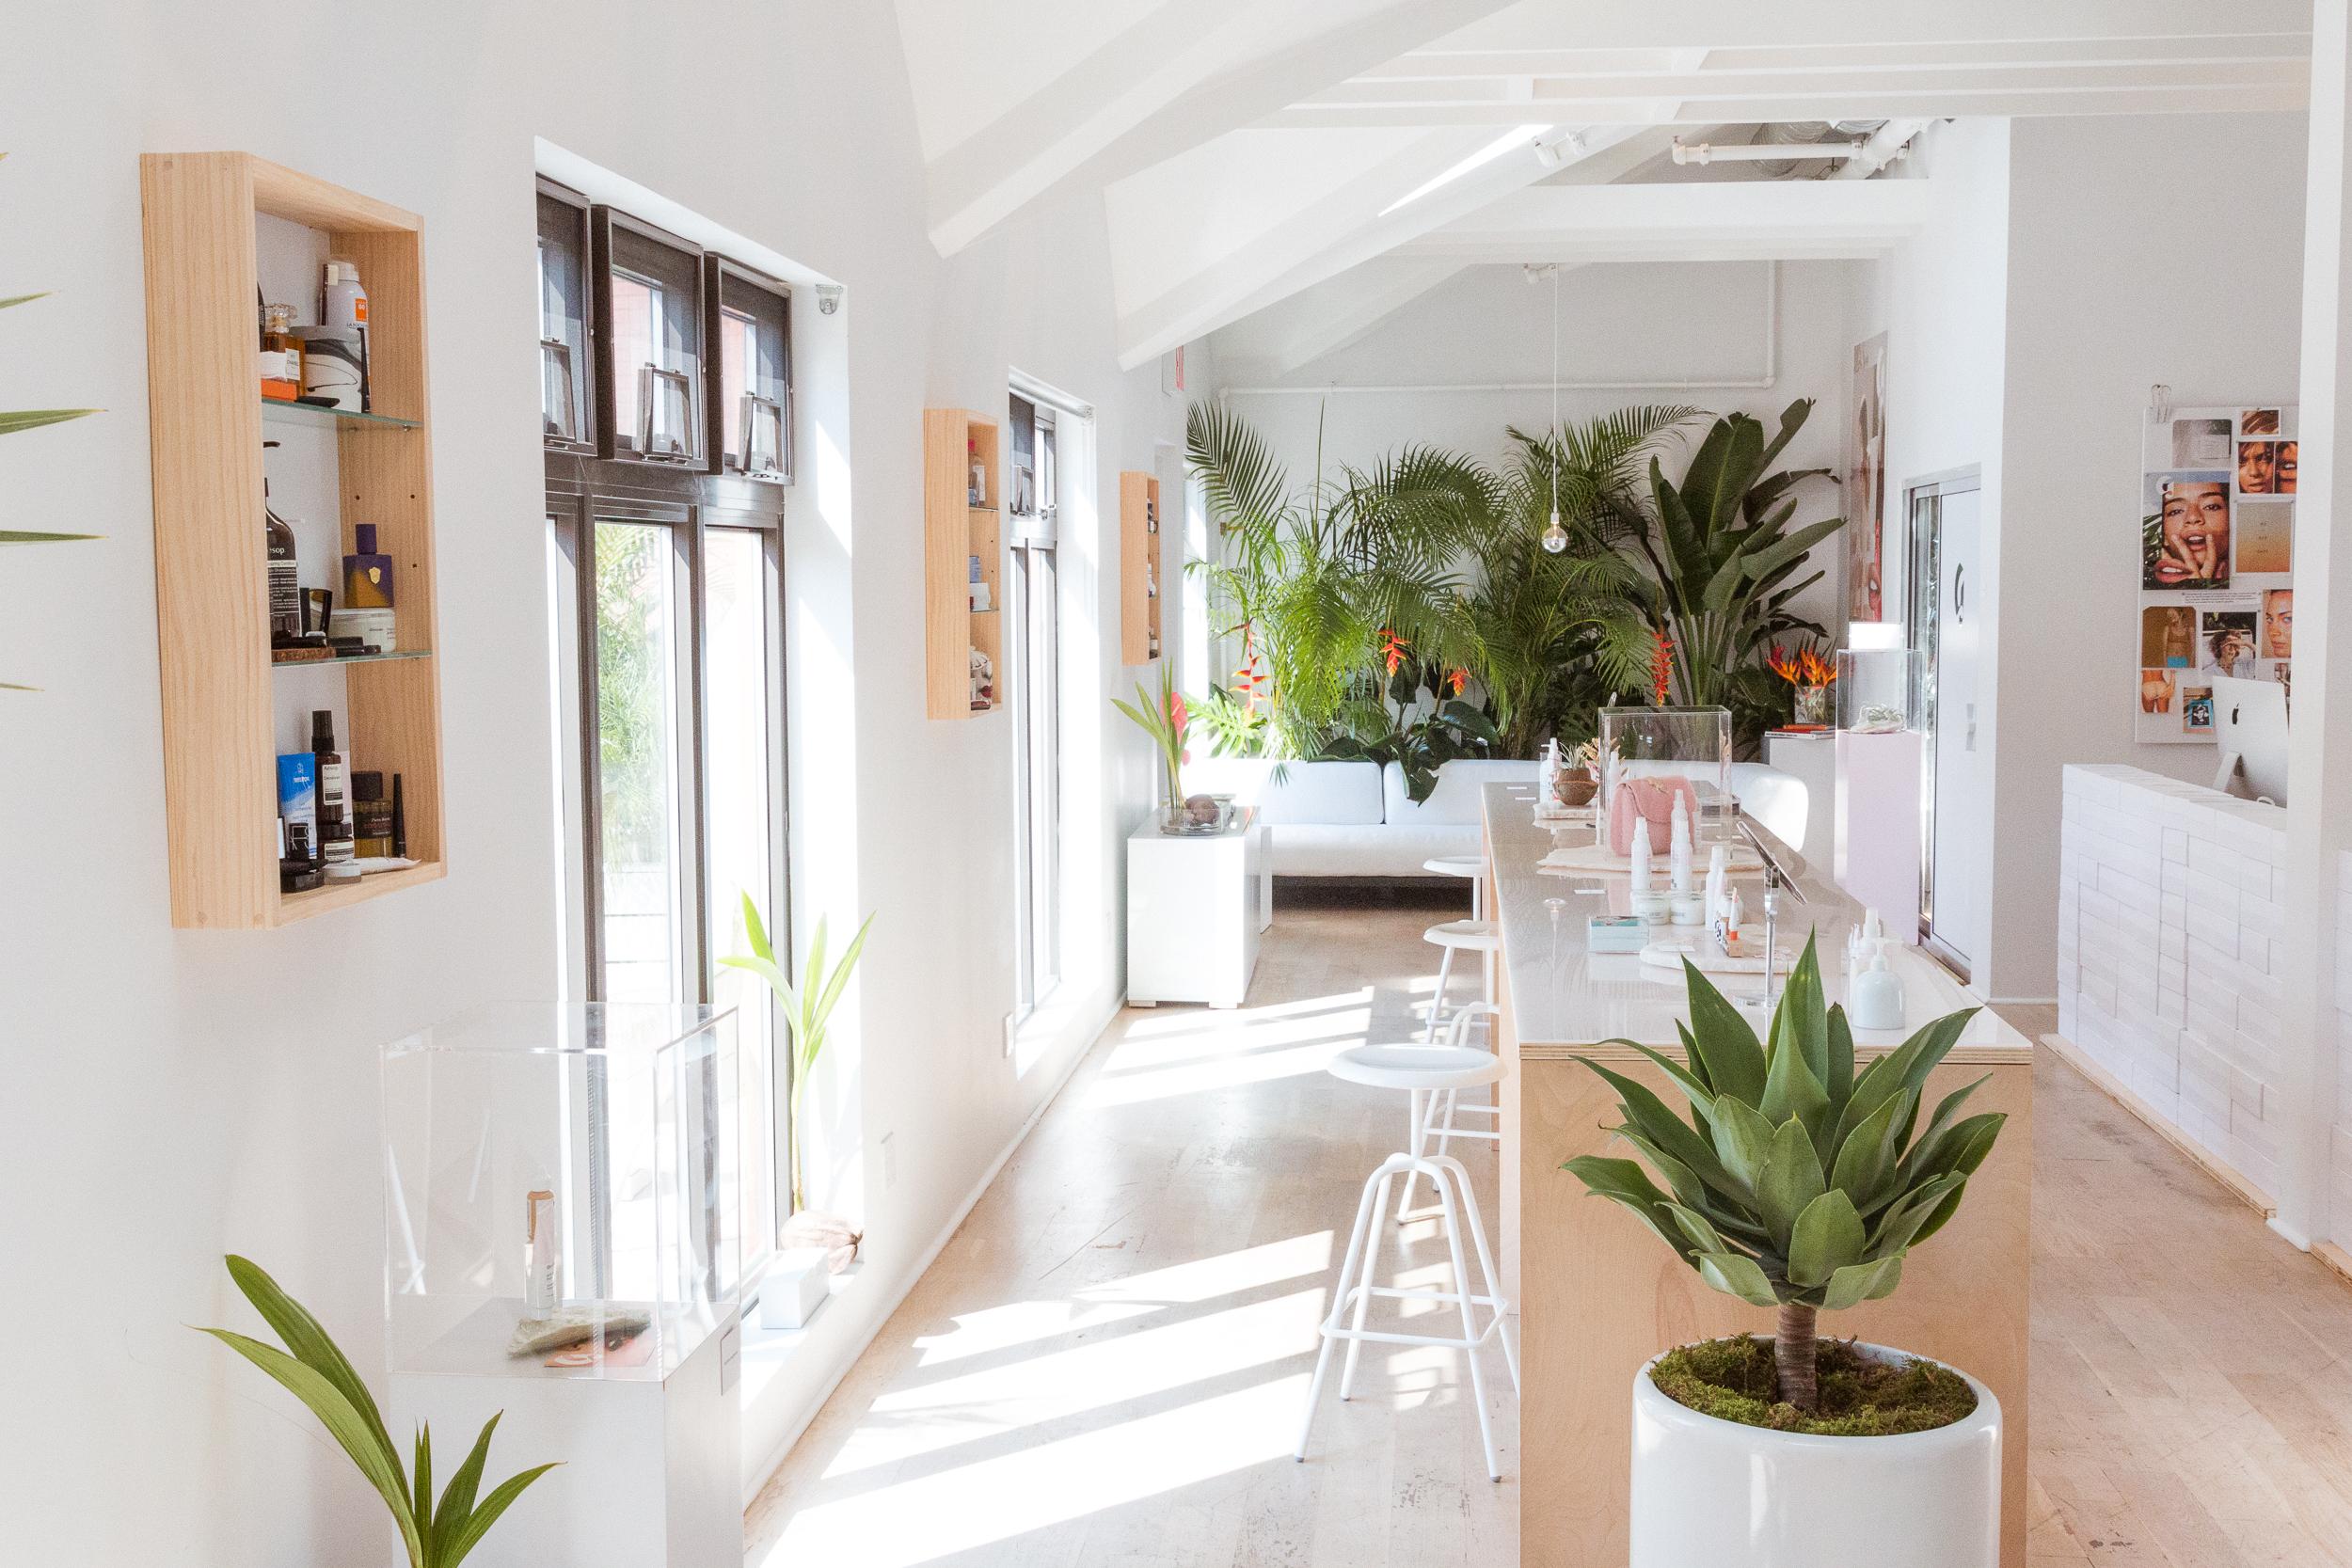 Glossier's showroom